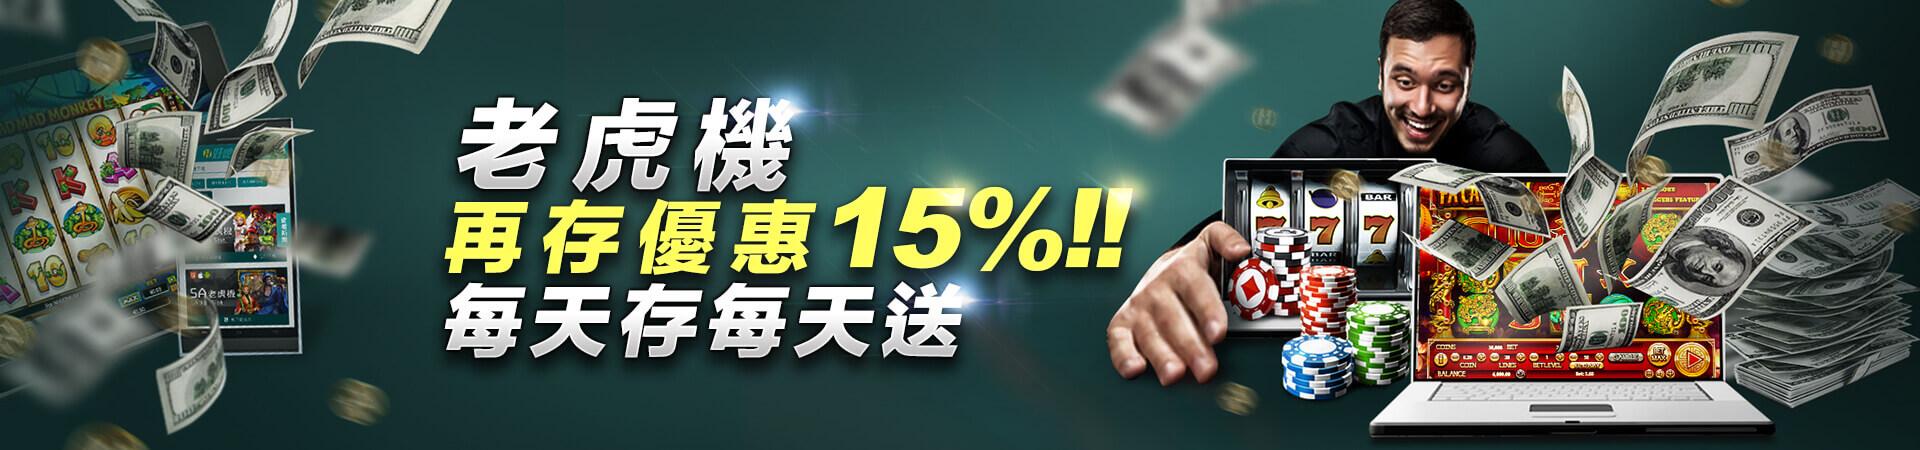 HOYA娛樂城老虎機再存送15%!!